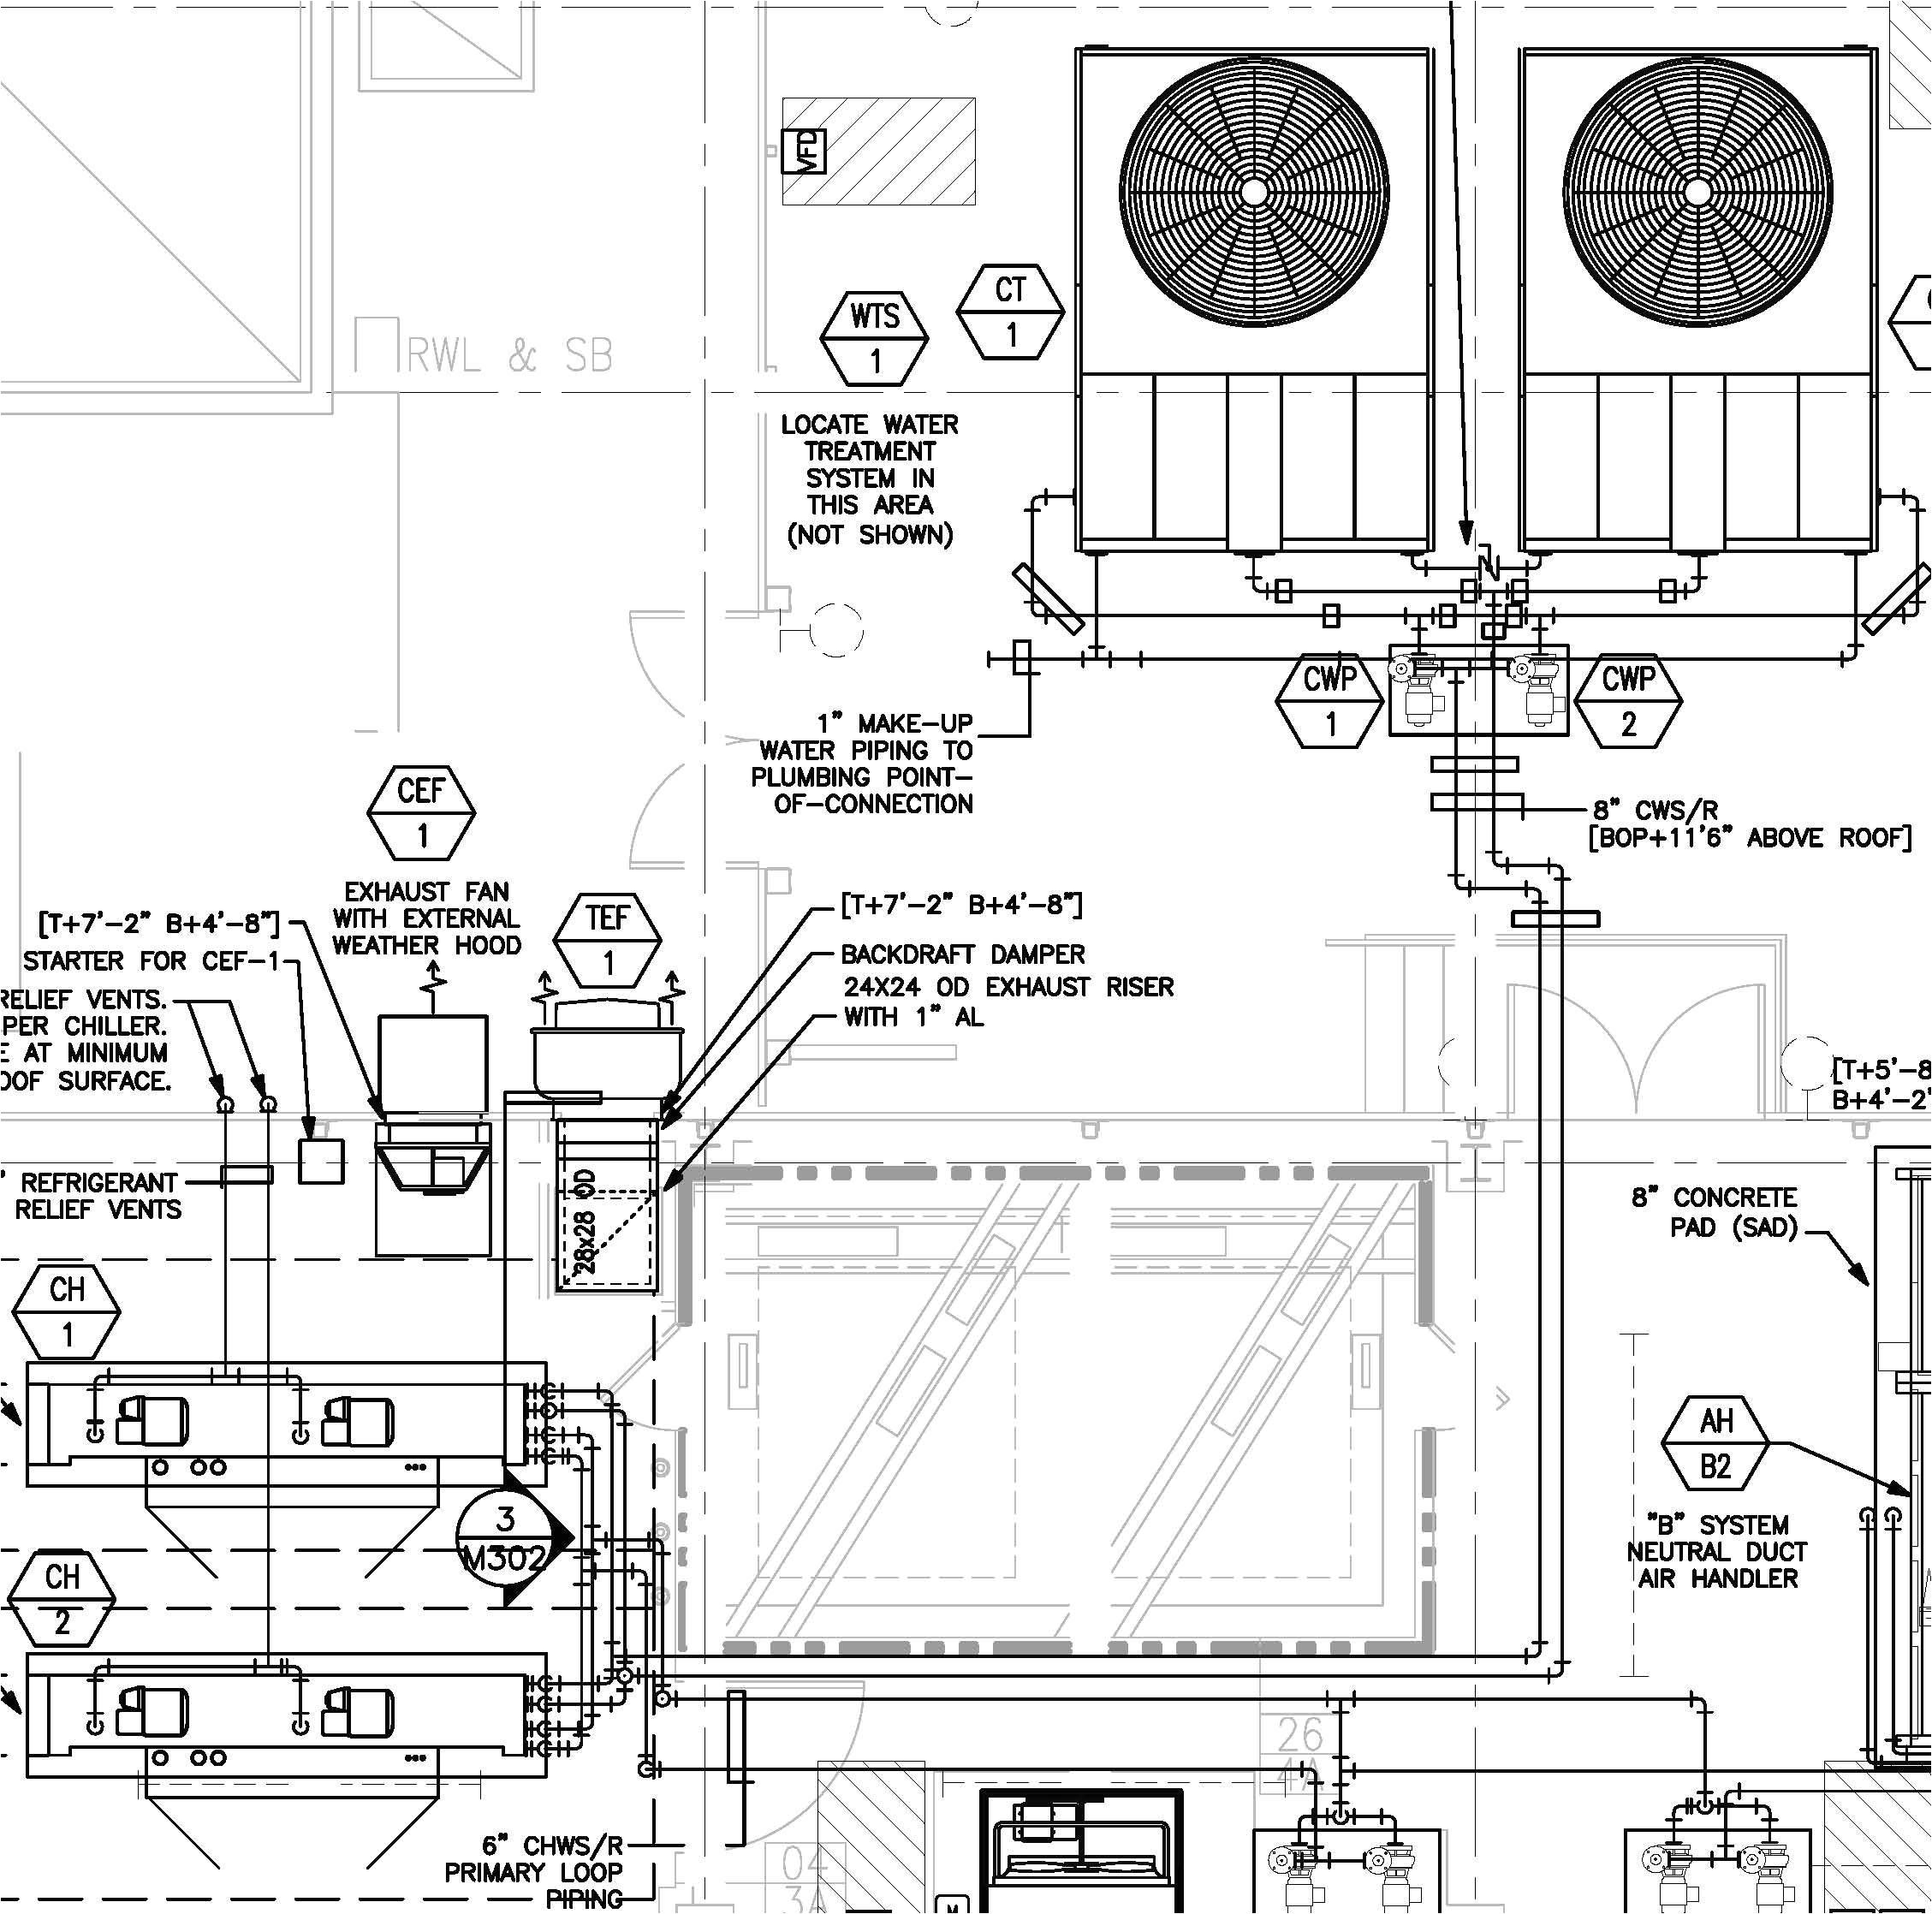 ucs wiring diagram wiring diagram ucs wiring diagram